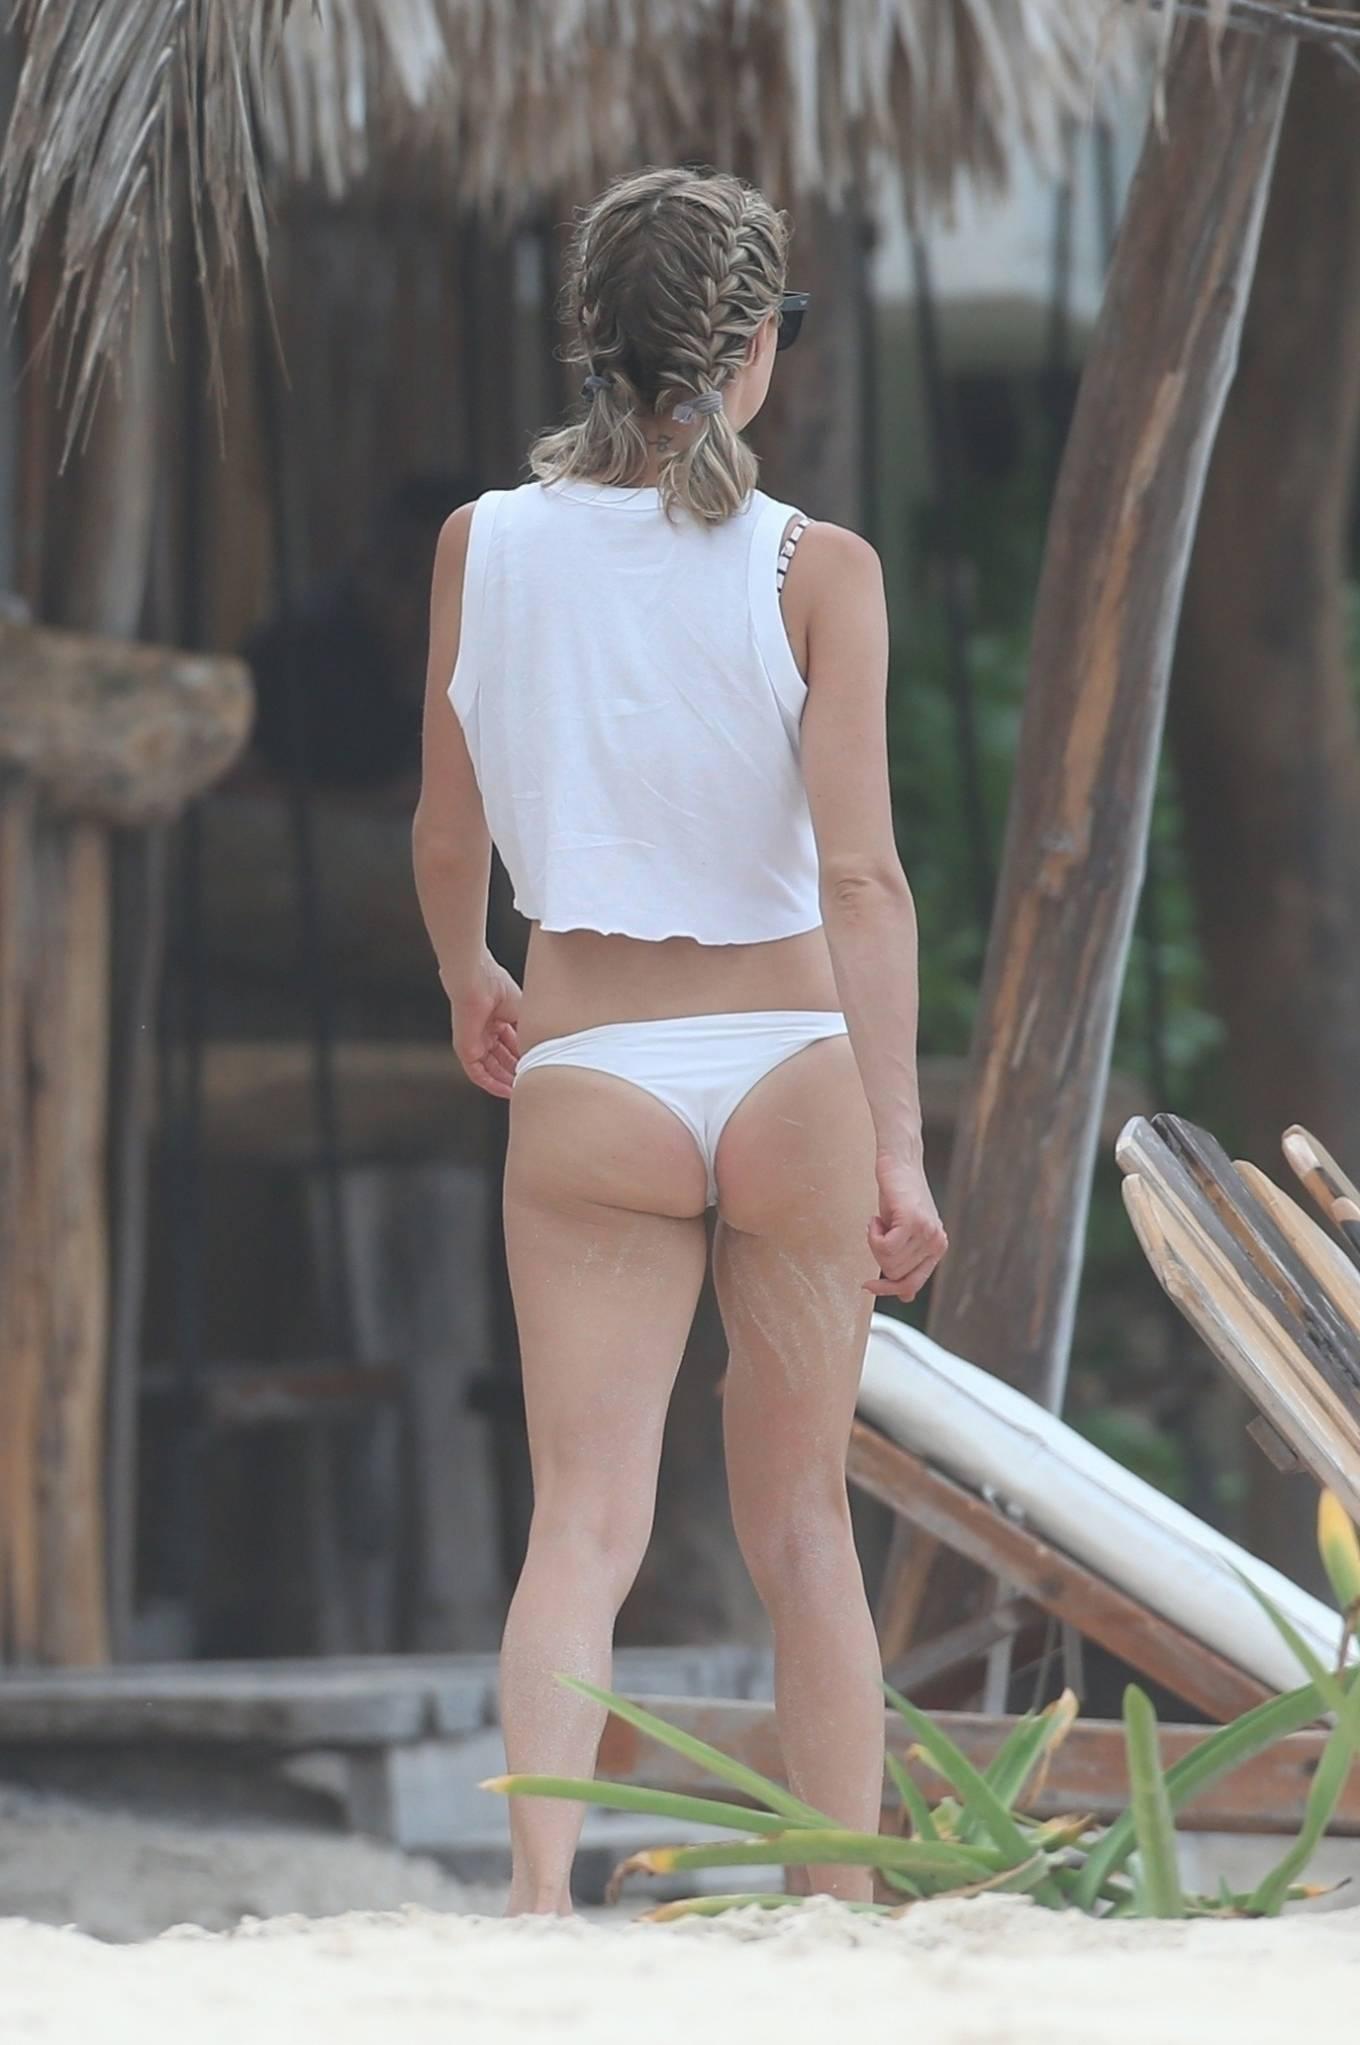 Kristin Cavallari 2020 : Kristin Cavallari – In a white bikini on the beach in Tulum -15